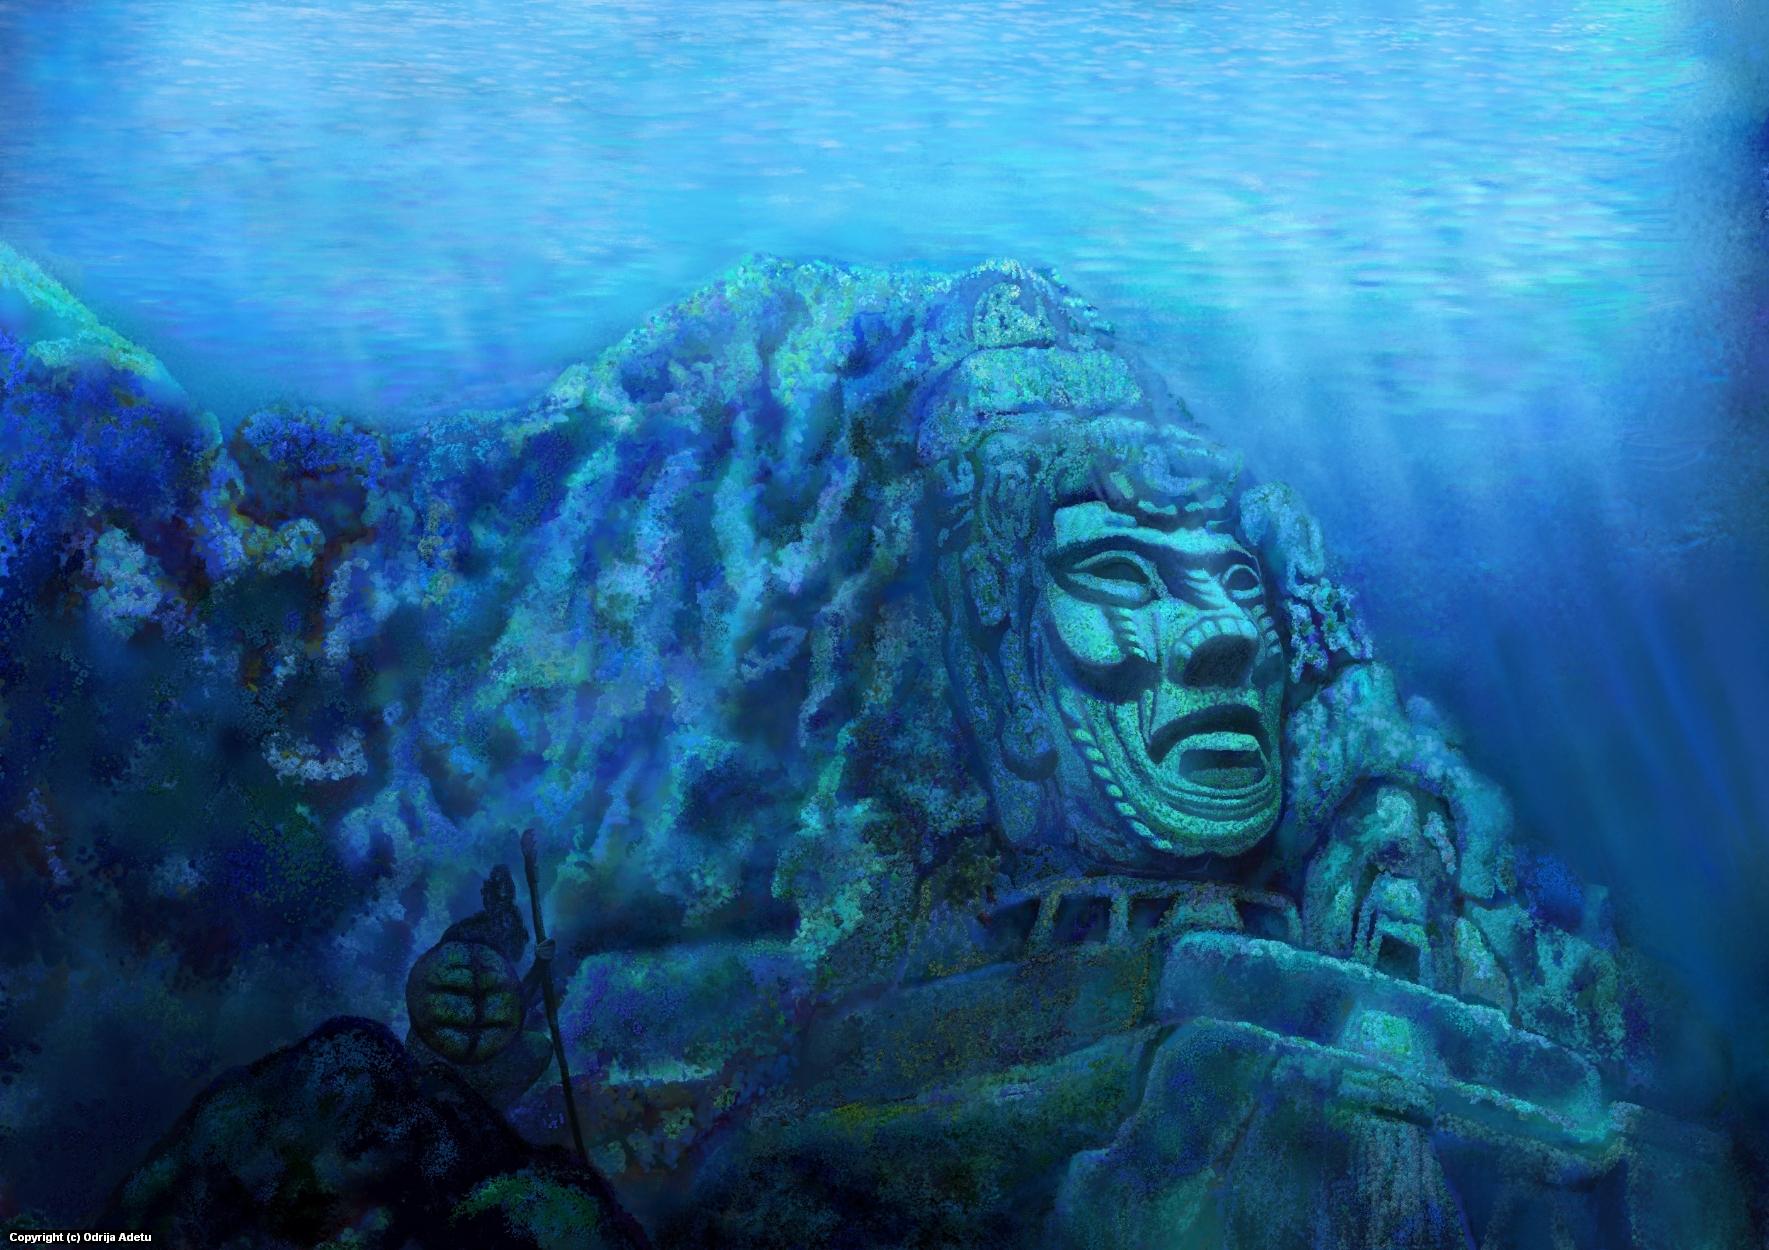 Guardian of Secret Temple Artwork by Odrija Adetu